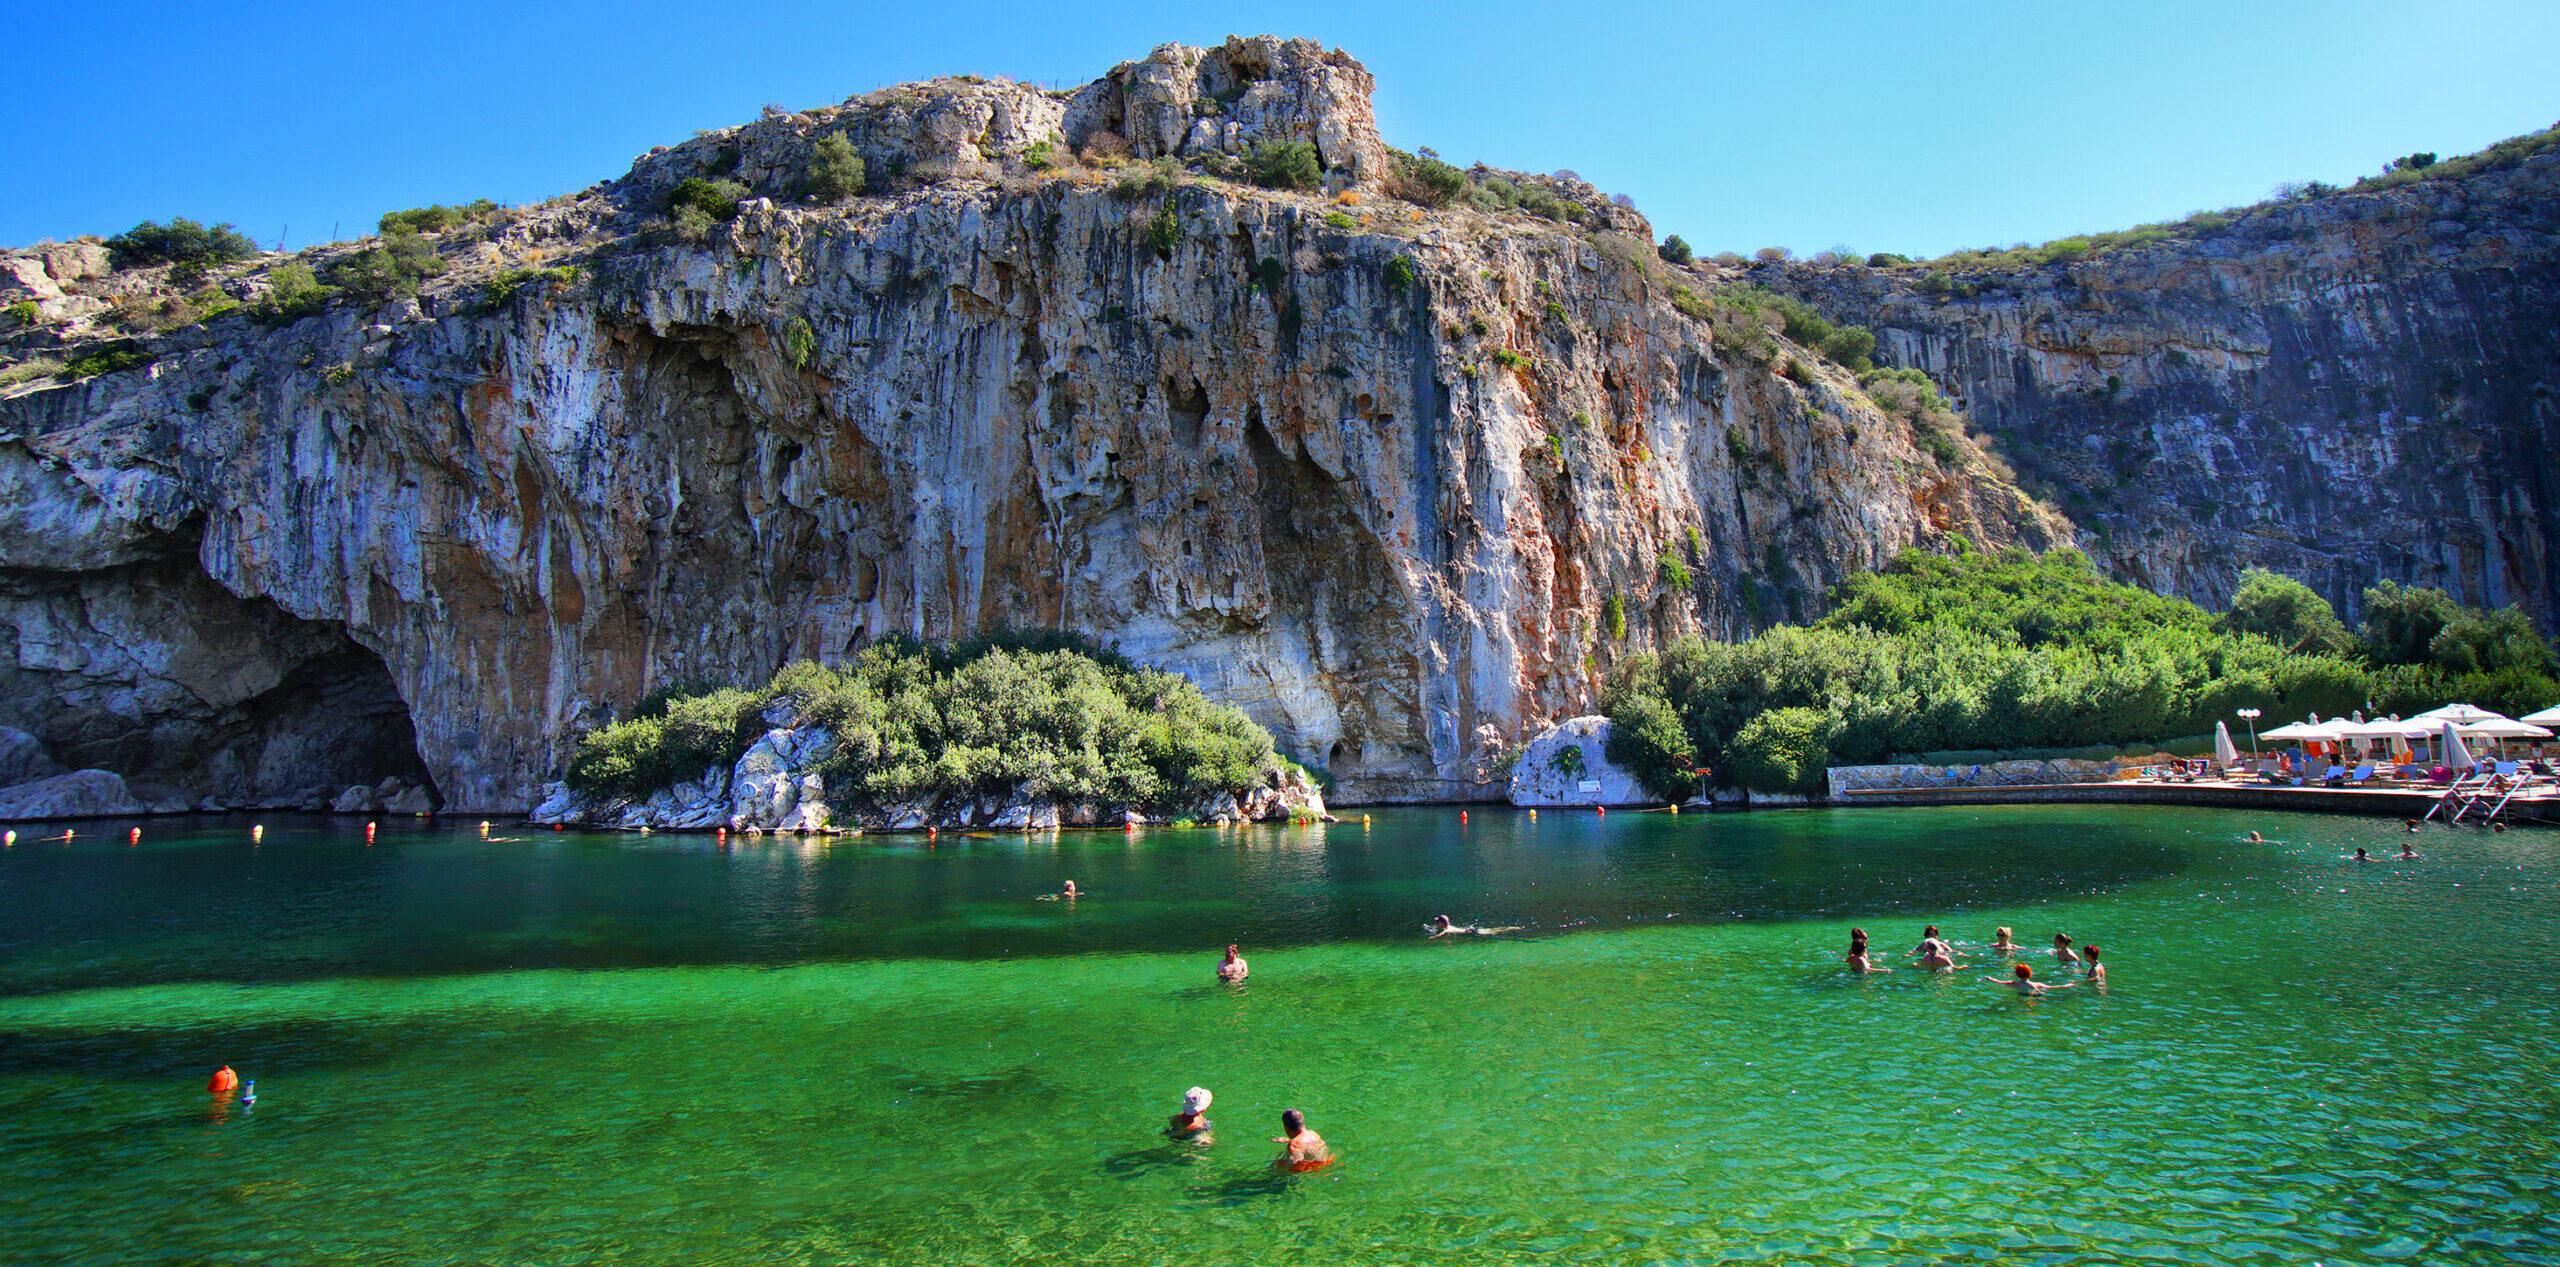 Attica: hot winter dips in Vouliagmeni lagoon